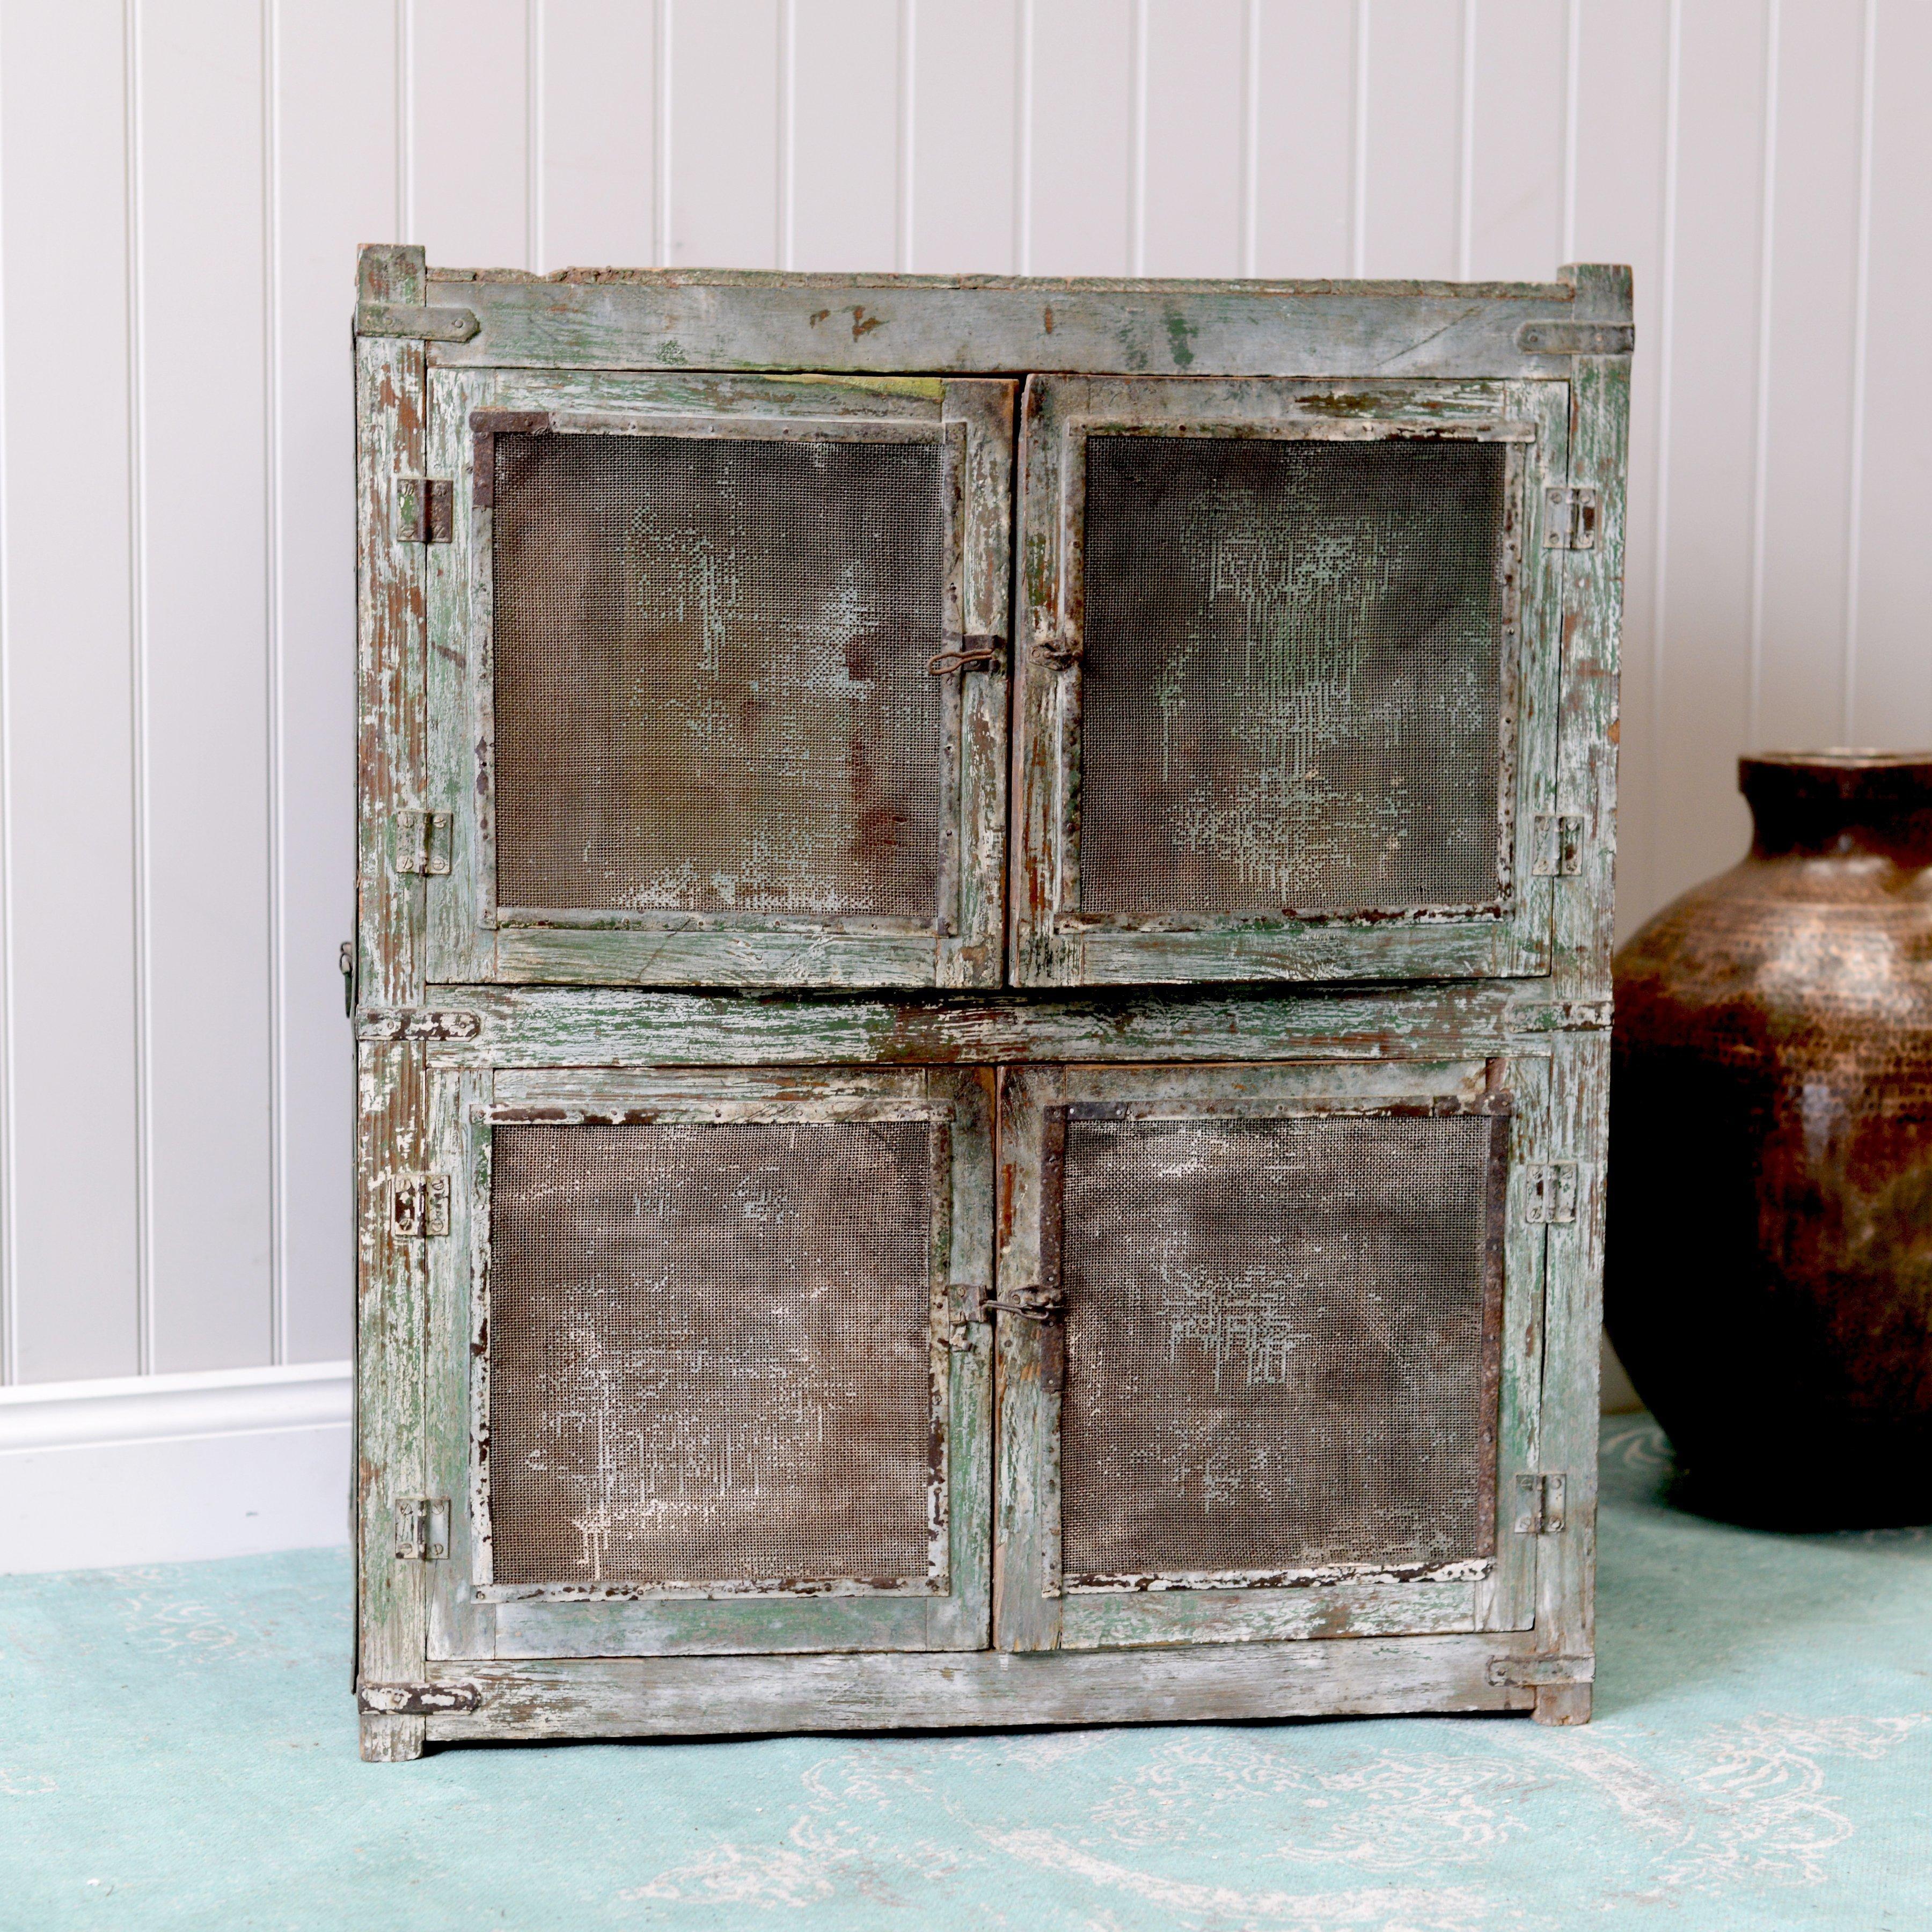 vintage-cabinet-113-752e66bd-fff7-4f14-b3c0-c40e893f471e.jpg